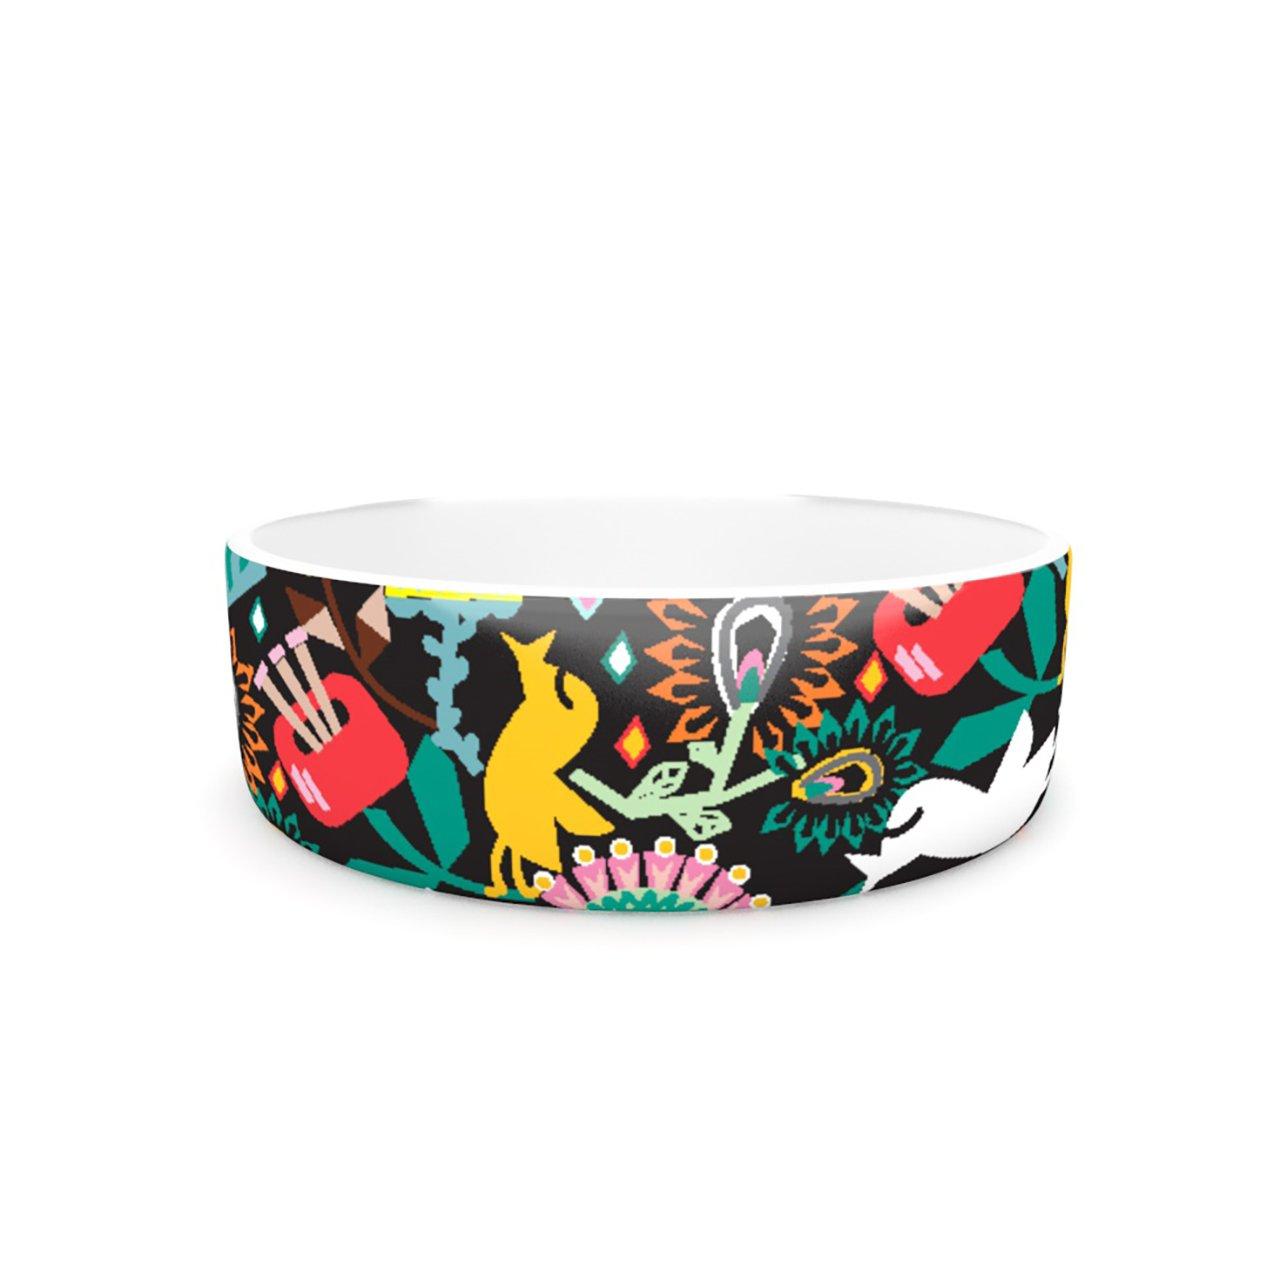 Kess InHouse Agnes Schugardt Folk Fusion  Pet Bowl, 7-Inch, Rainbow Abstract